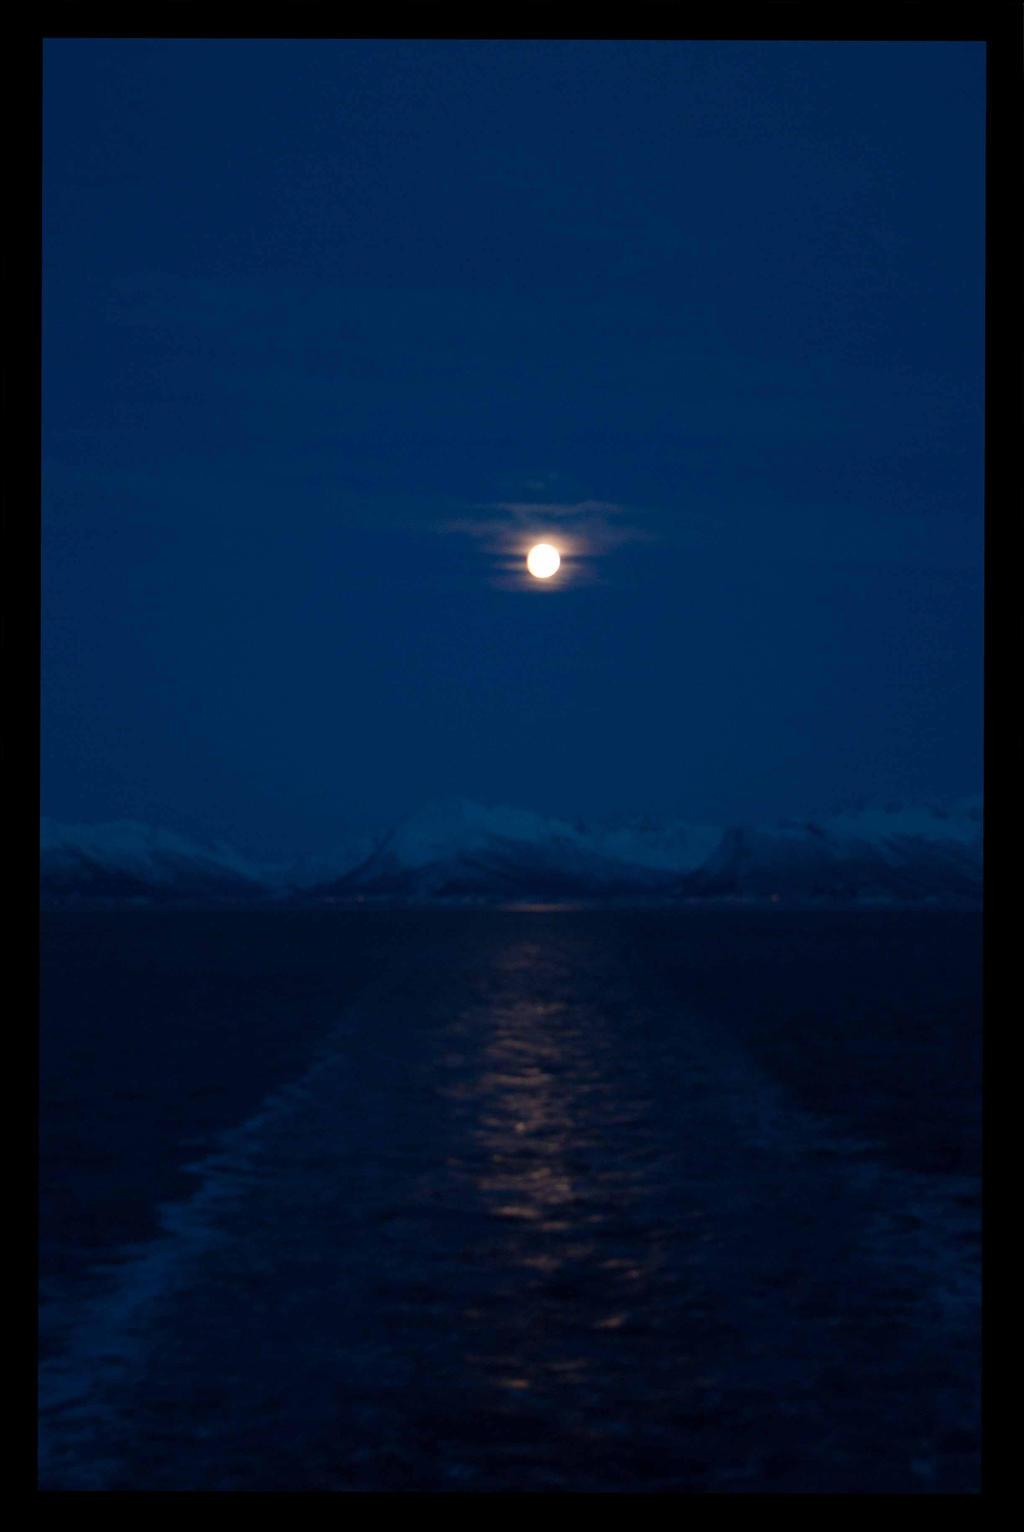 Norway - 2013 12 14 0621 by korenwolf